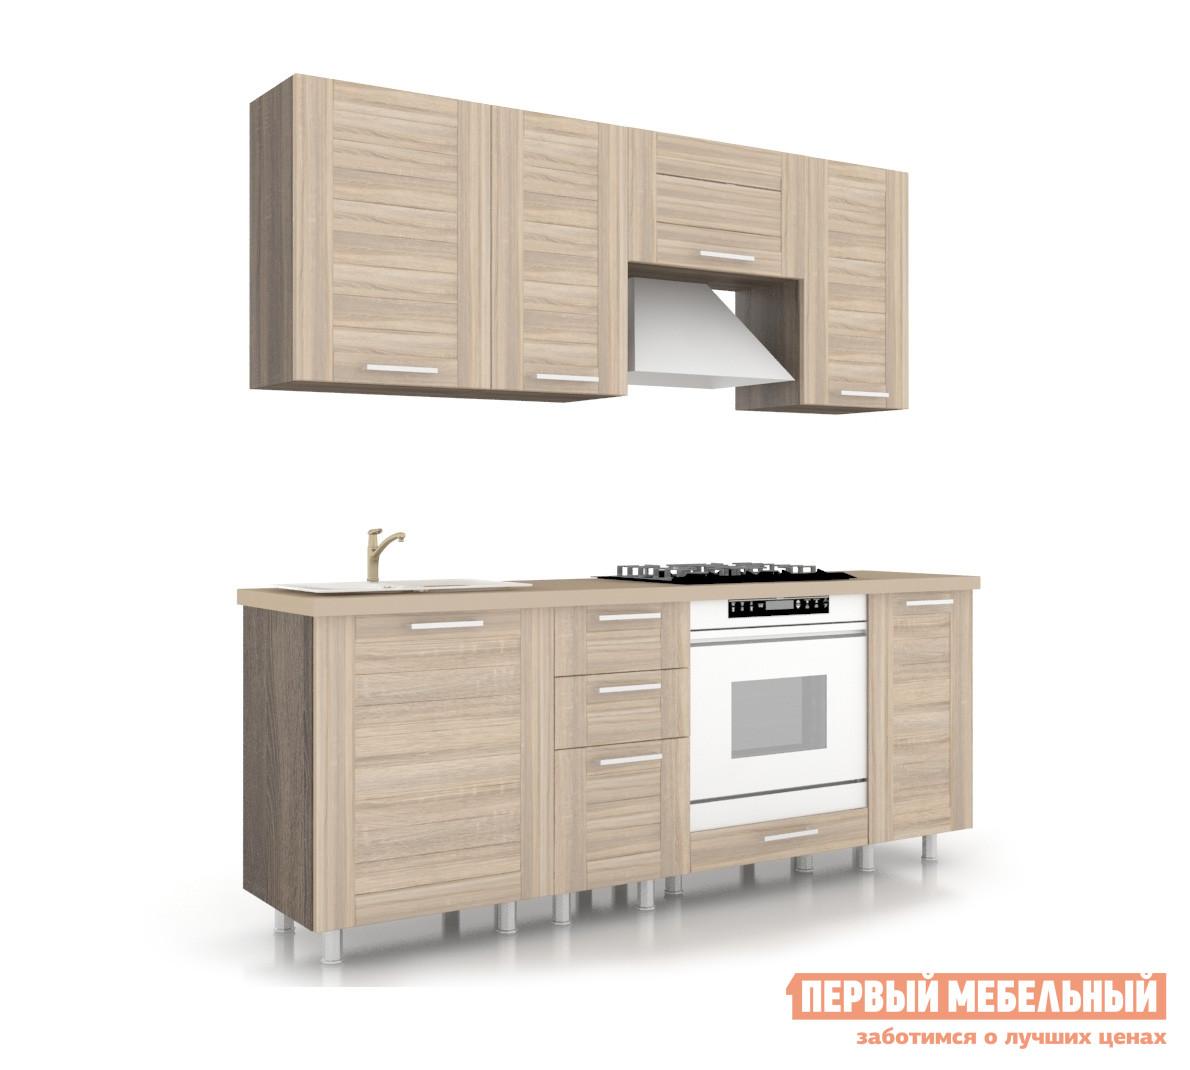 Кухонный гарнитур Любимый дом Анастасия 200 см Сонома любимый дом кухонный гарнитур анастасия